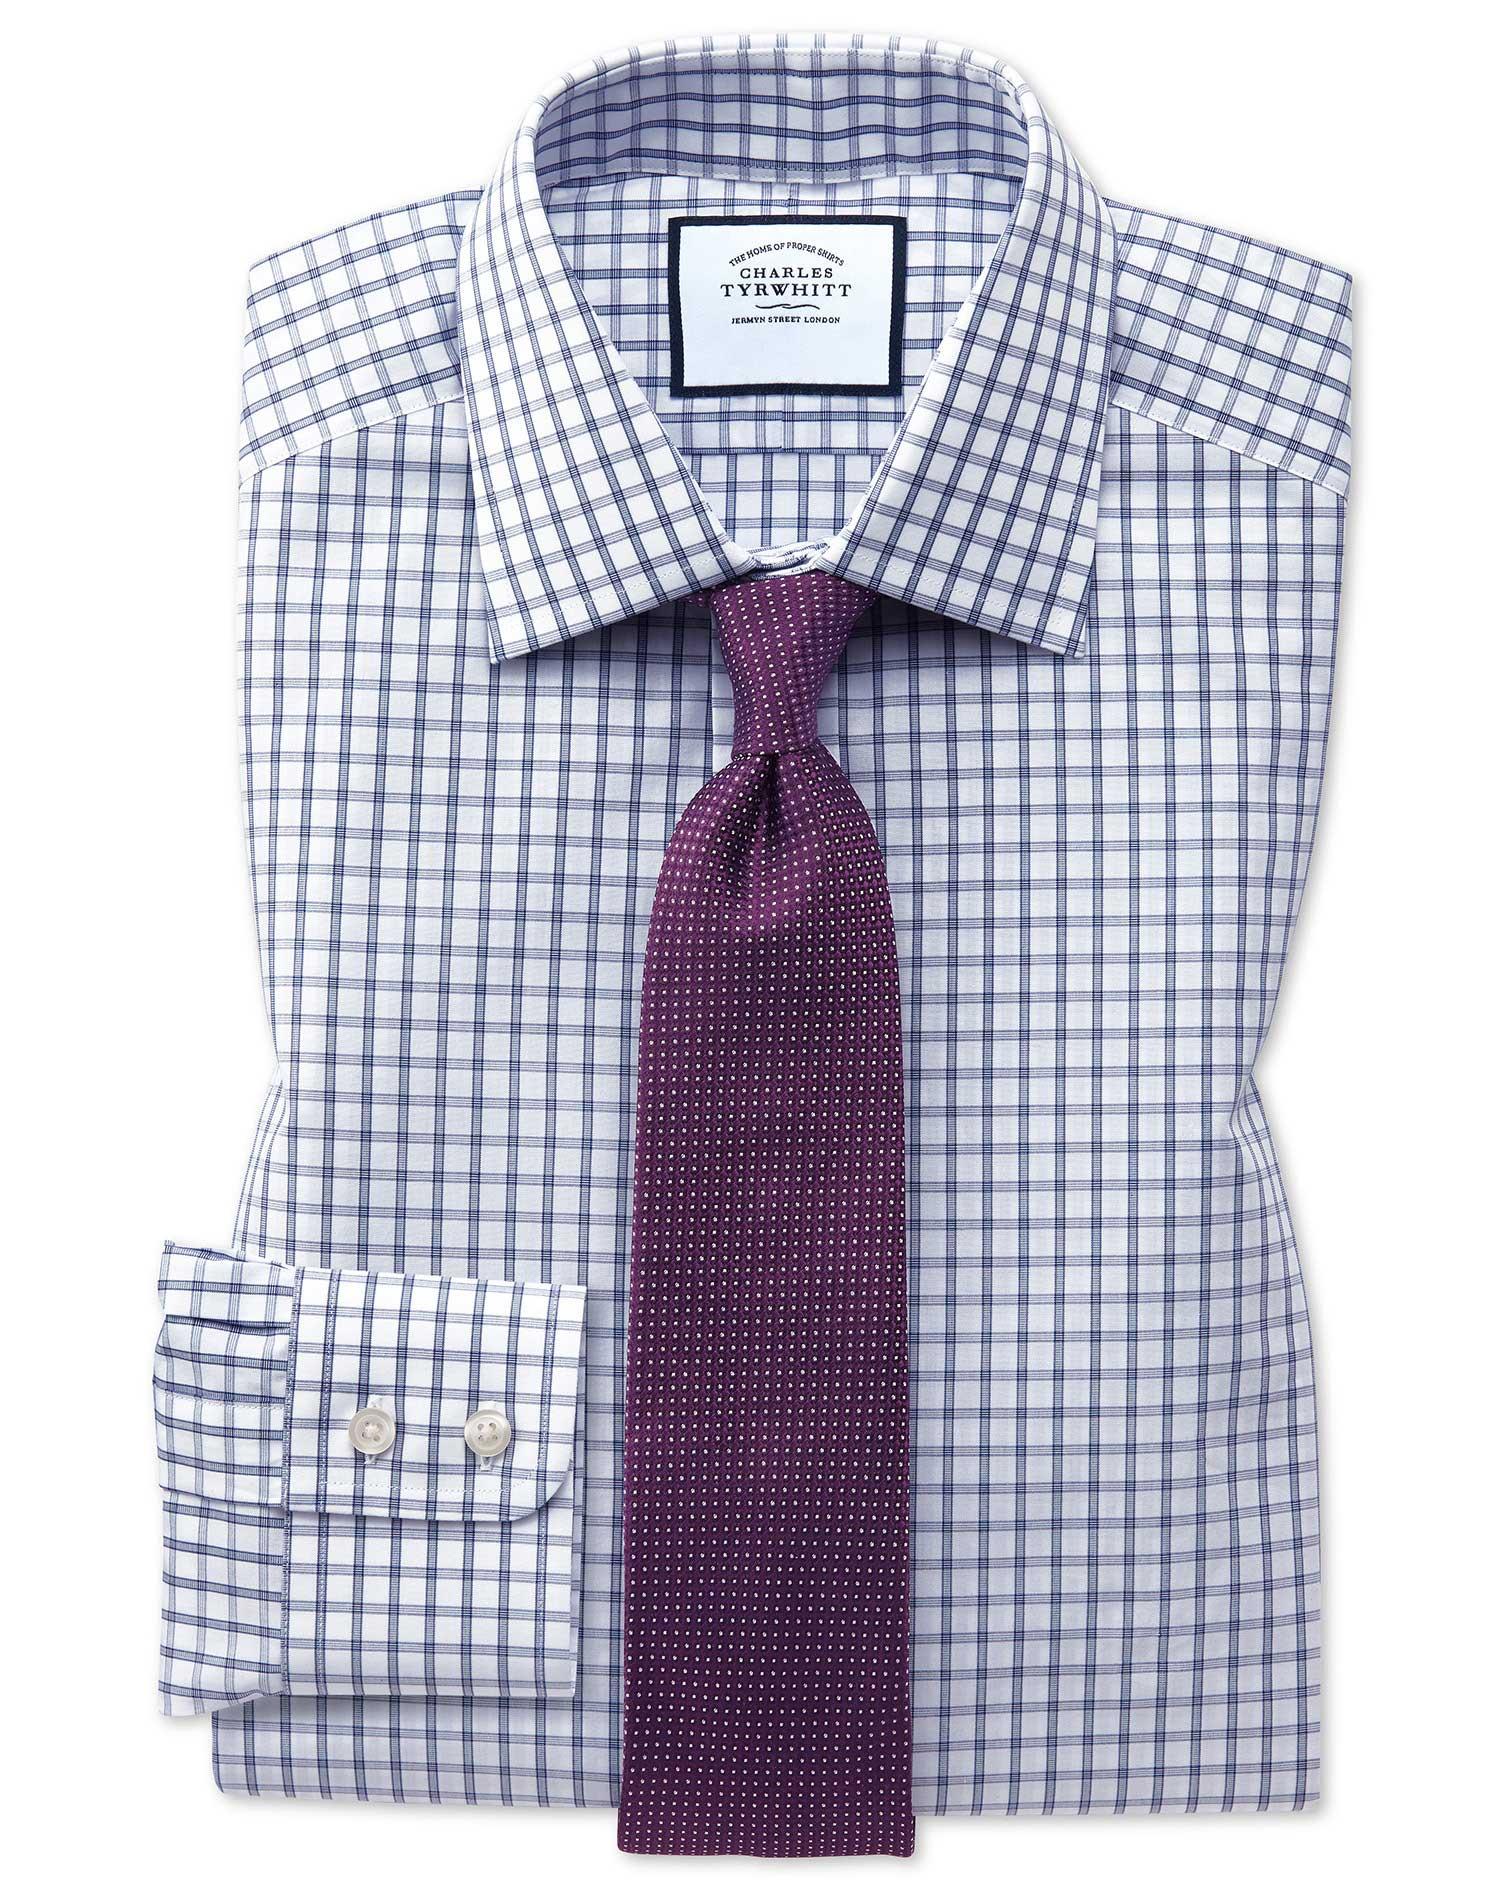 Classic Fit Blue Windowpane Check Cotton Formal Shirt Single Cuff Size 16/36 by Charles Tyrwhitt